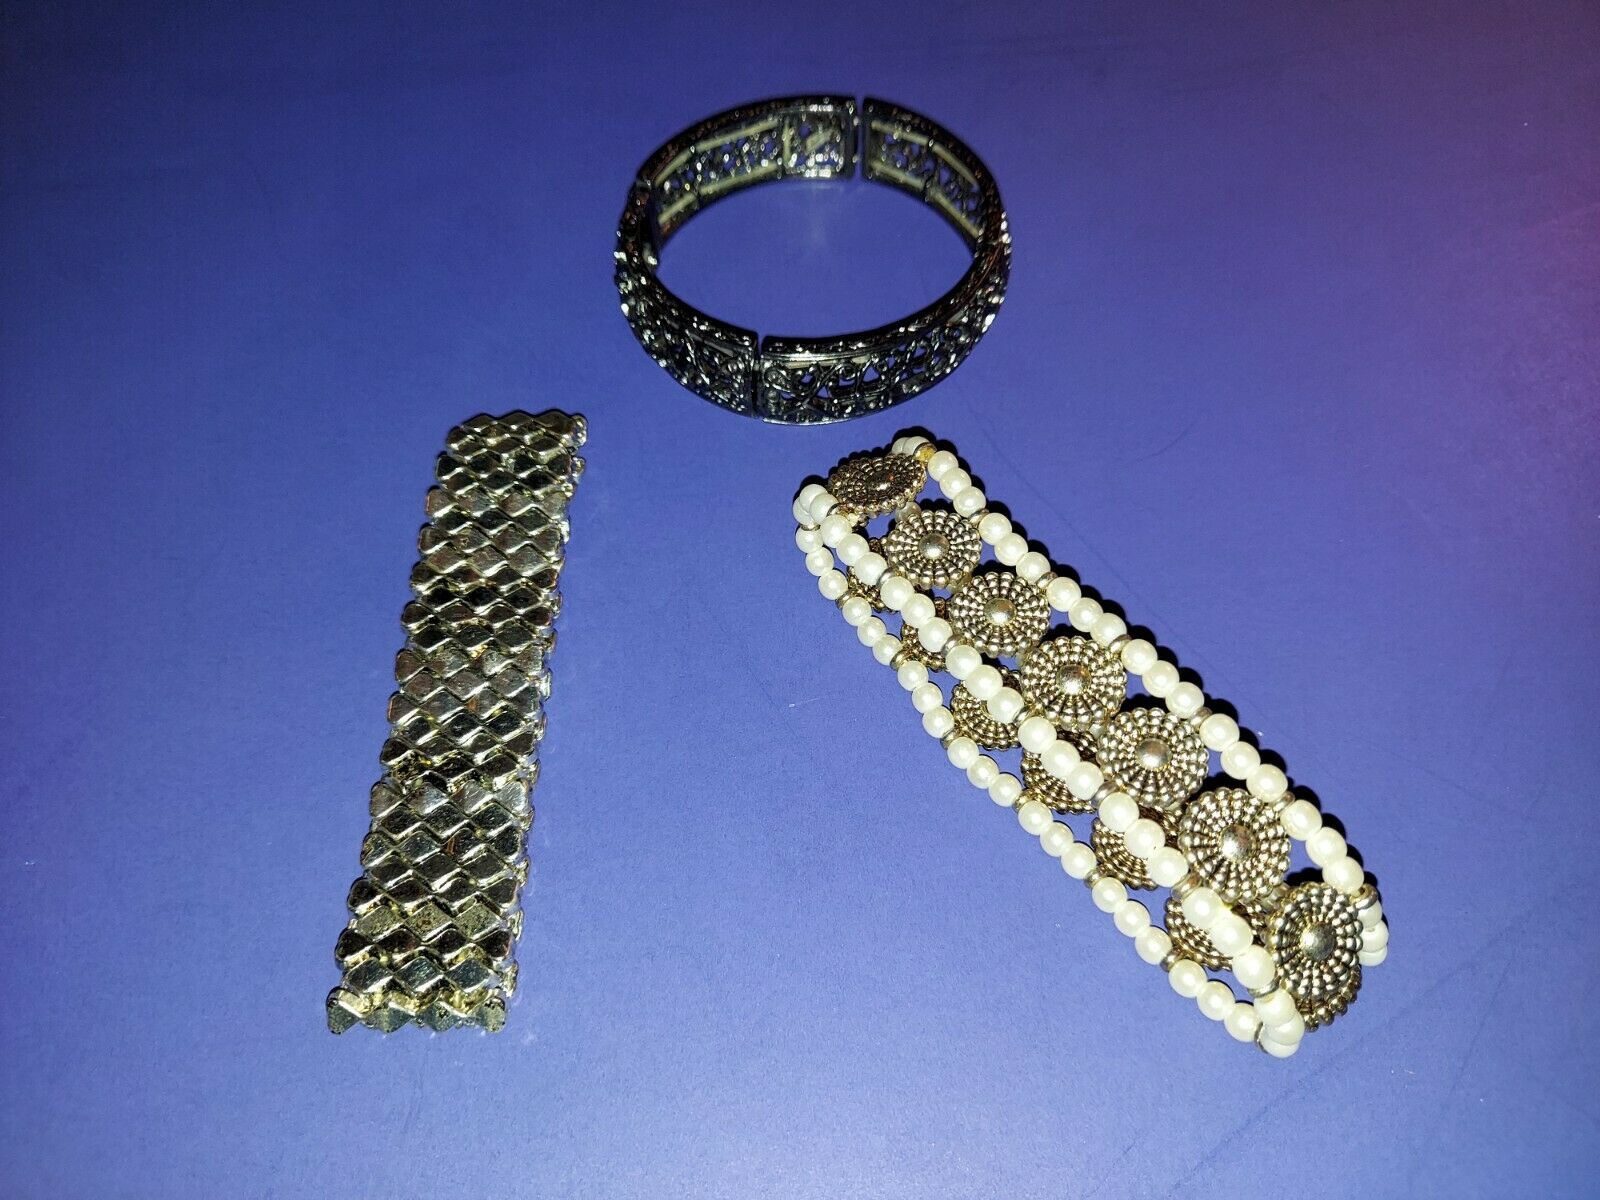 Bracelet Lot, Costume Jewelry - image 2